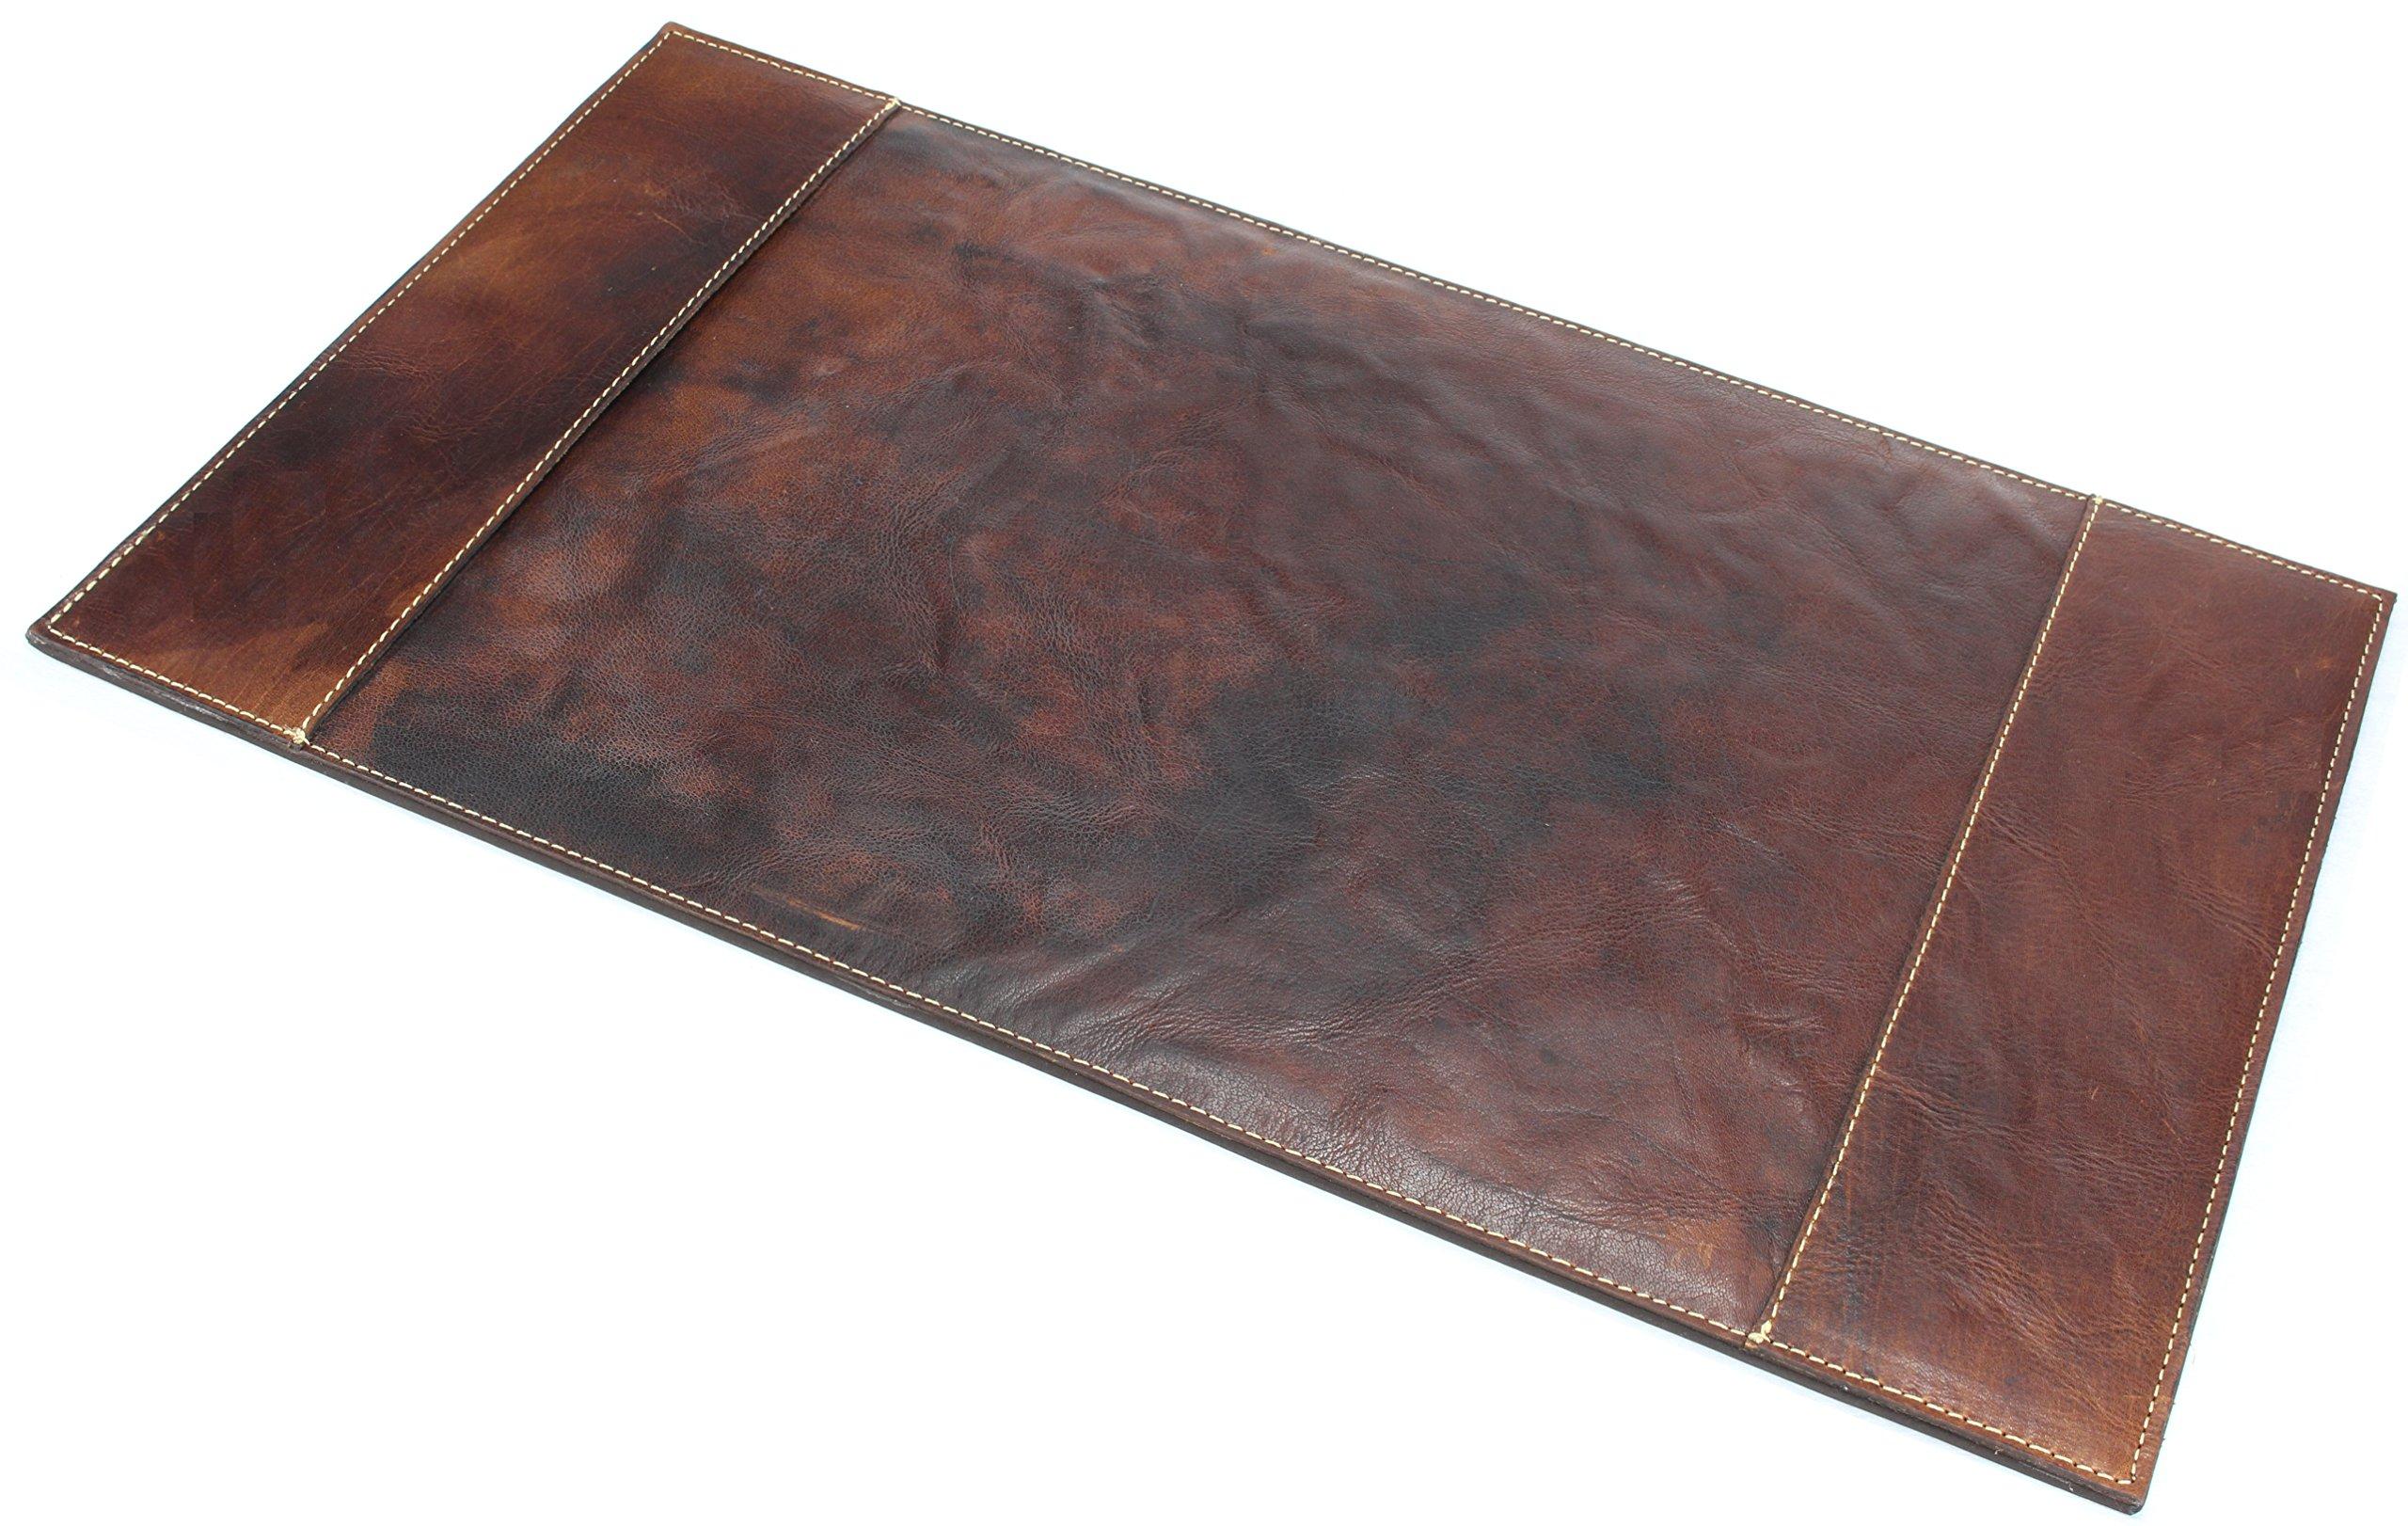 ALPENLEDER Desk Pad ''PIEMONT'' | Made Of Buffalo Leather | Men Women Office Protector Mat Brown (Brandy) by ALPENLEDER